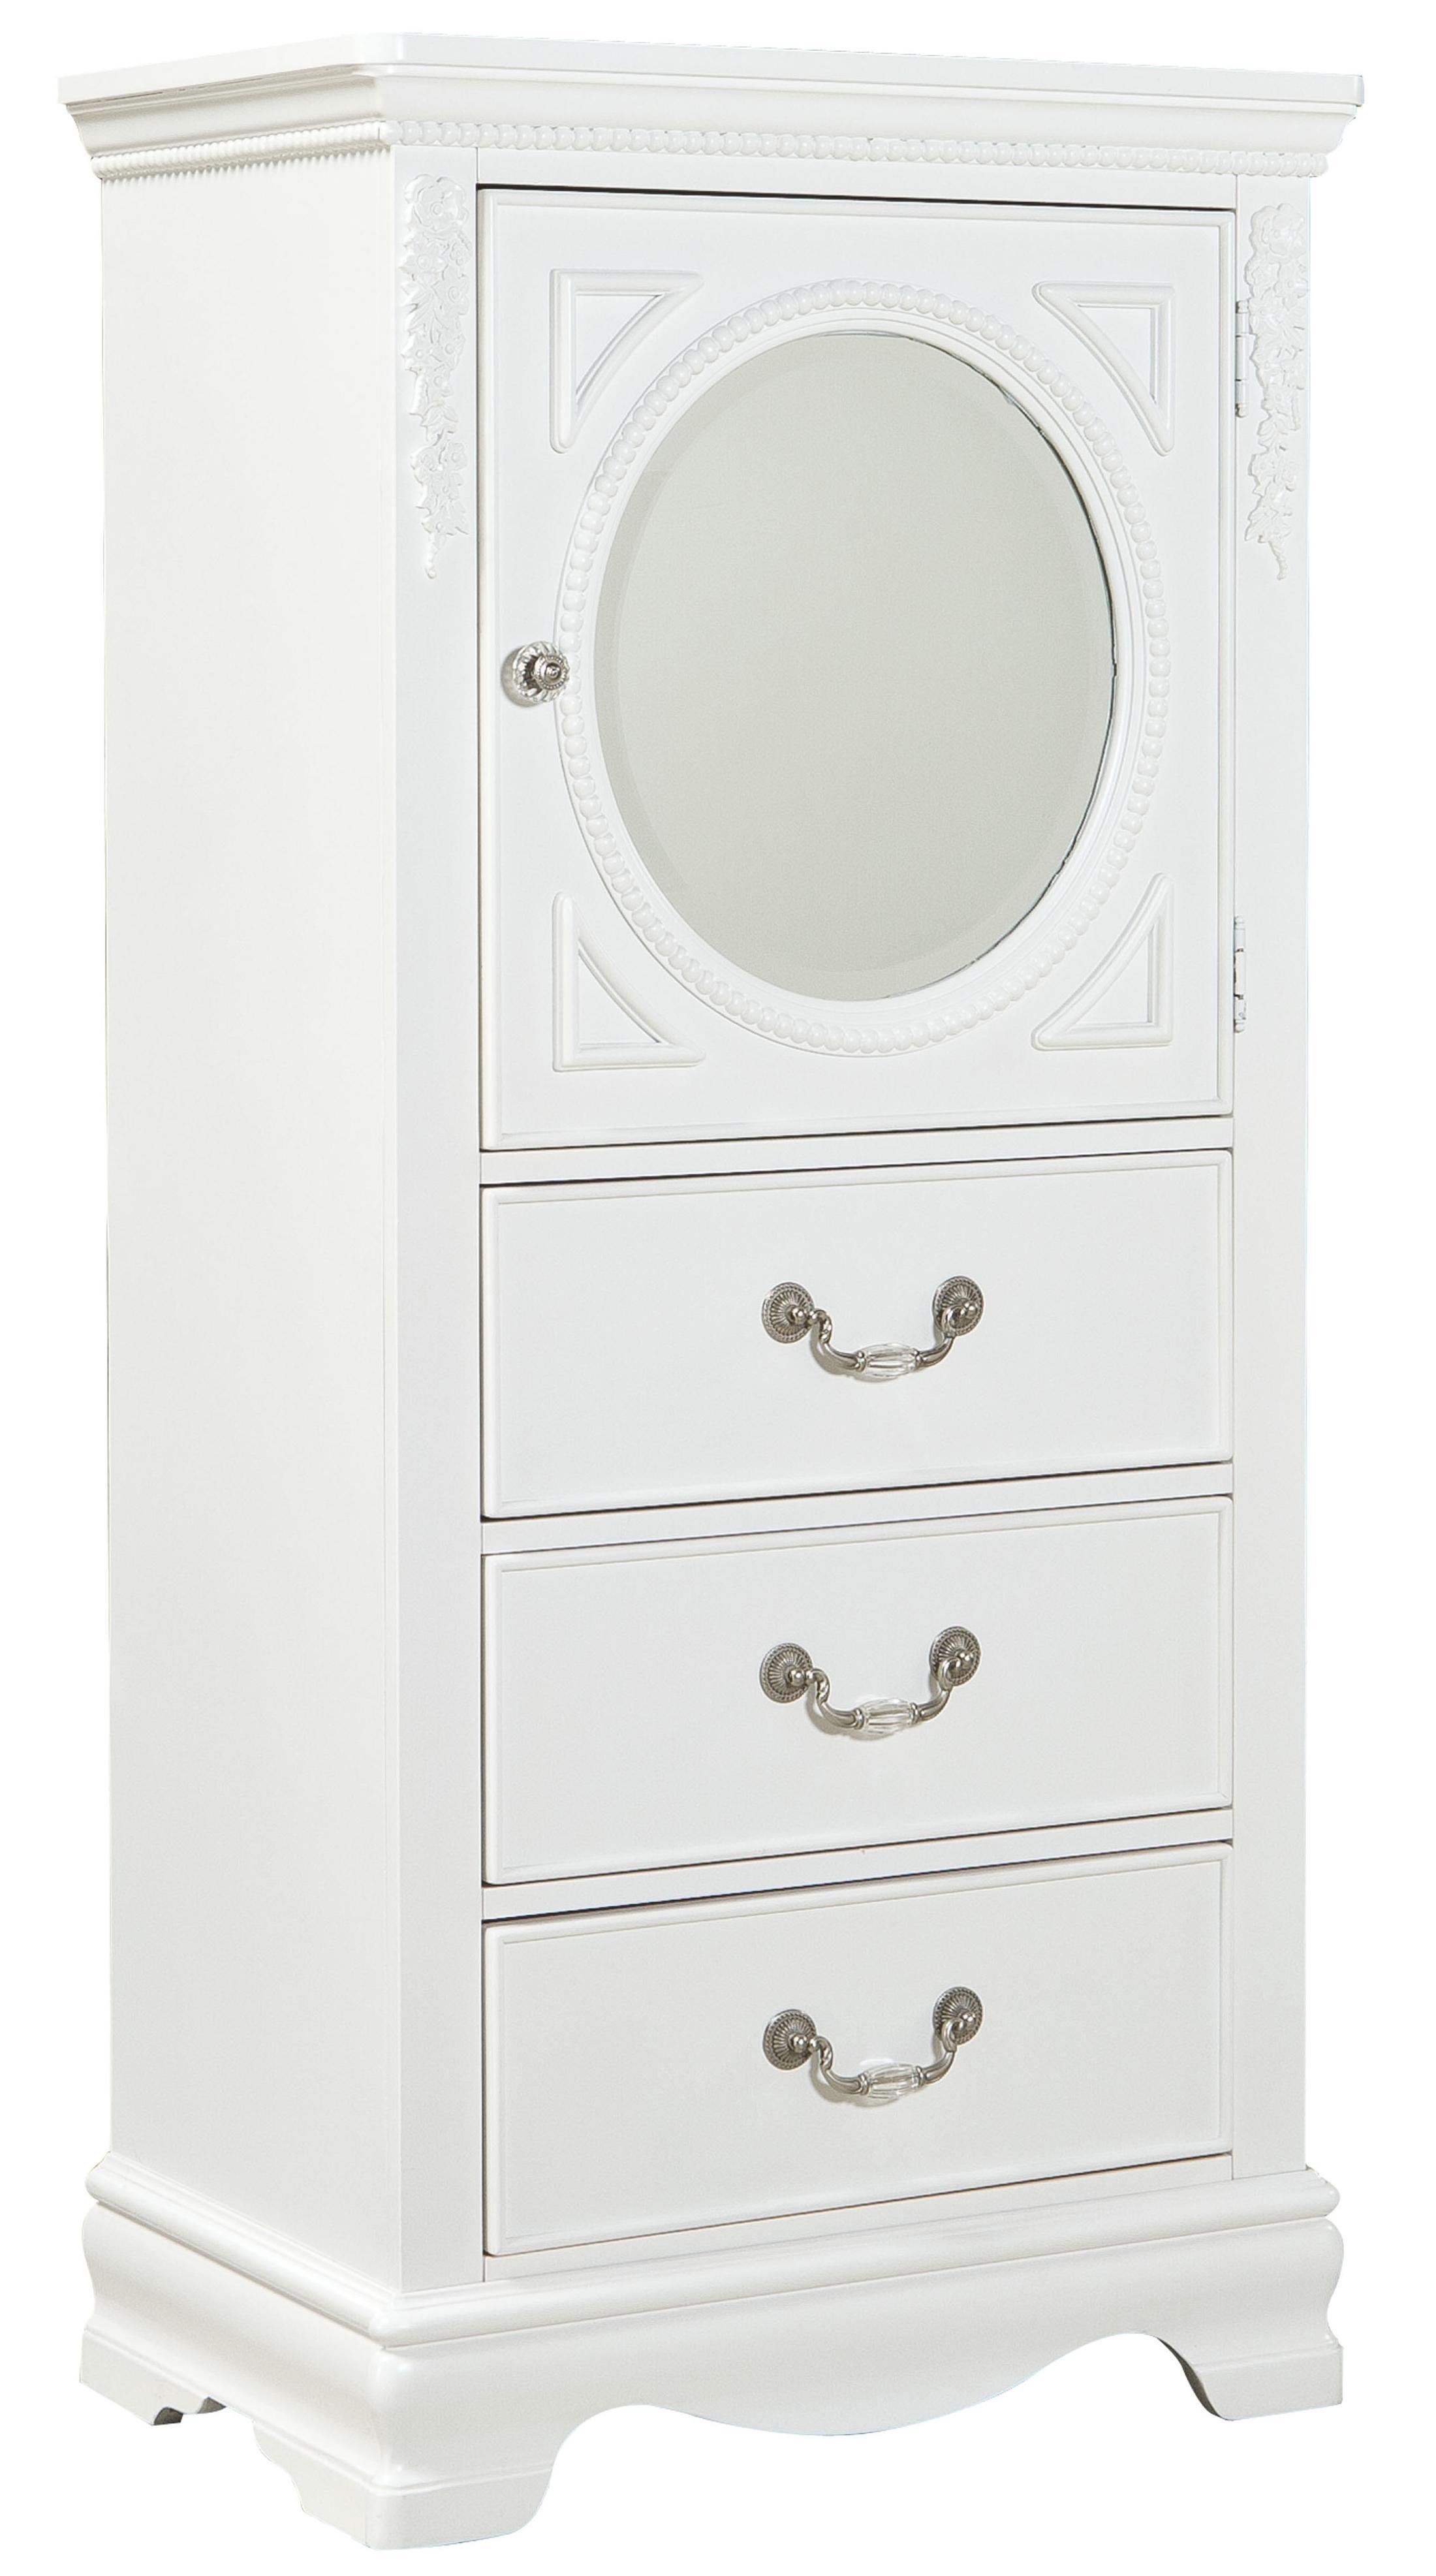 Standard Furniture Jessica Lingerie Chest - Item Number: 94215